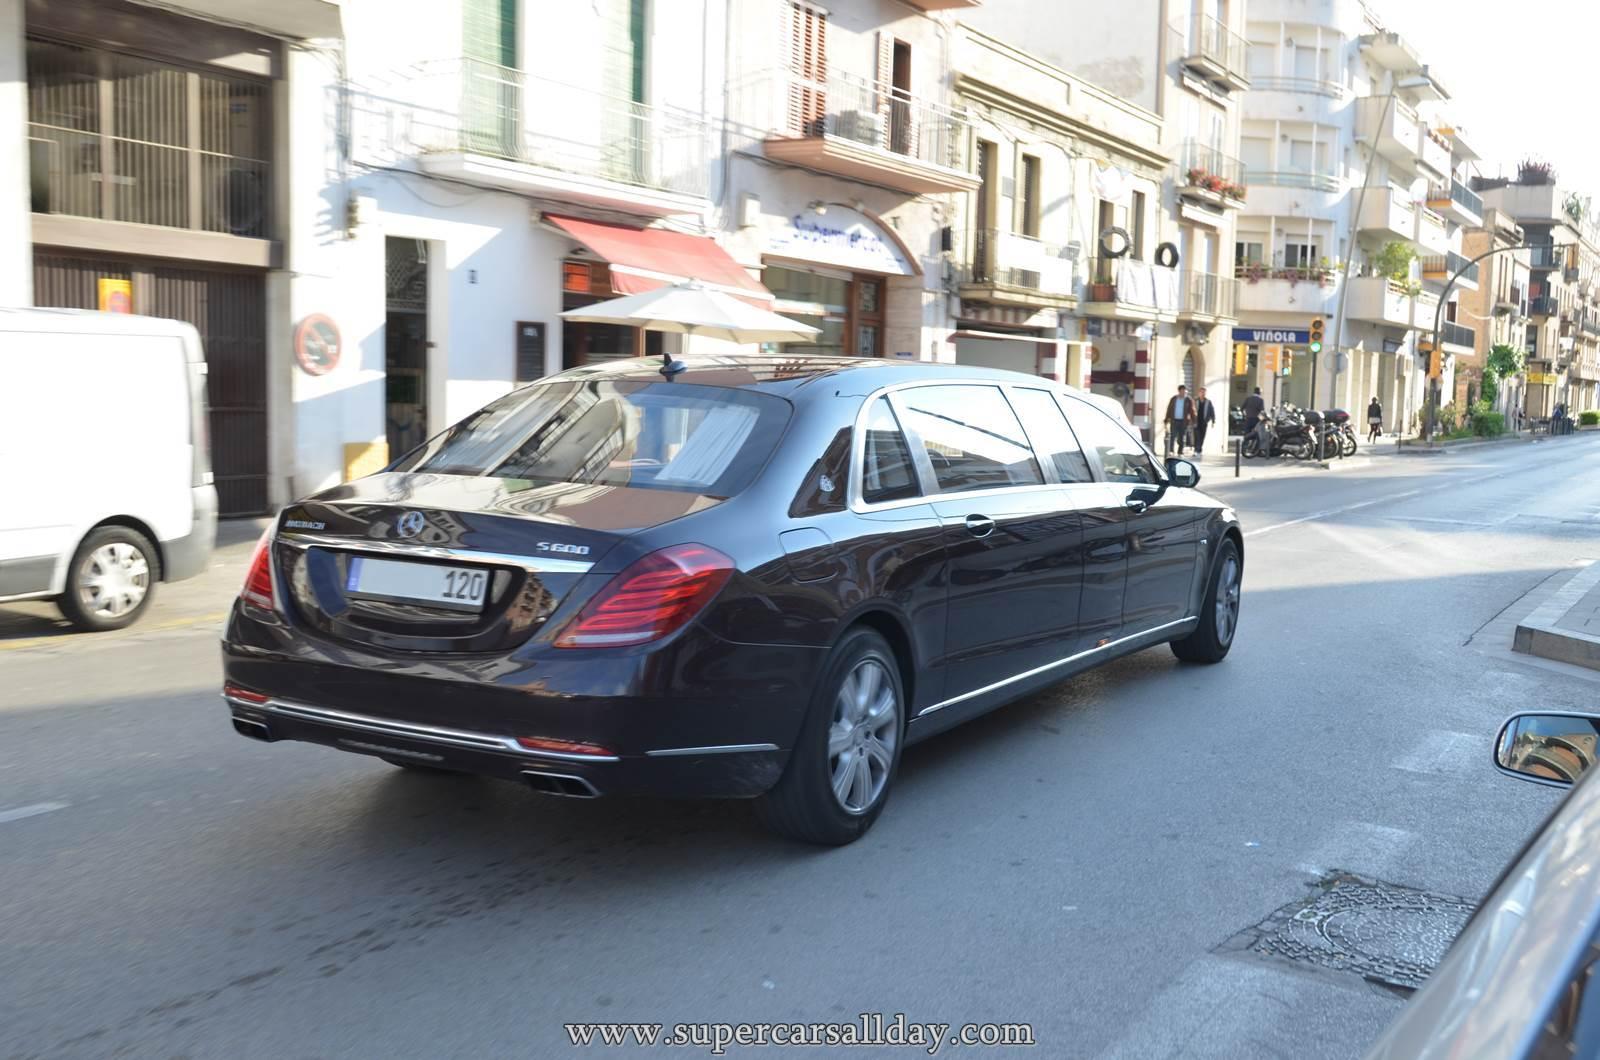 http://supercarsallday.com/wp-content/uploads/2016-Mercedes-Maybach-Pullman-5.jpg